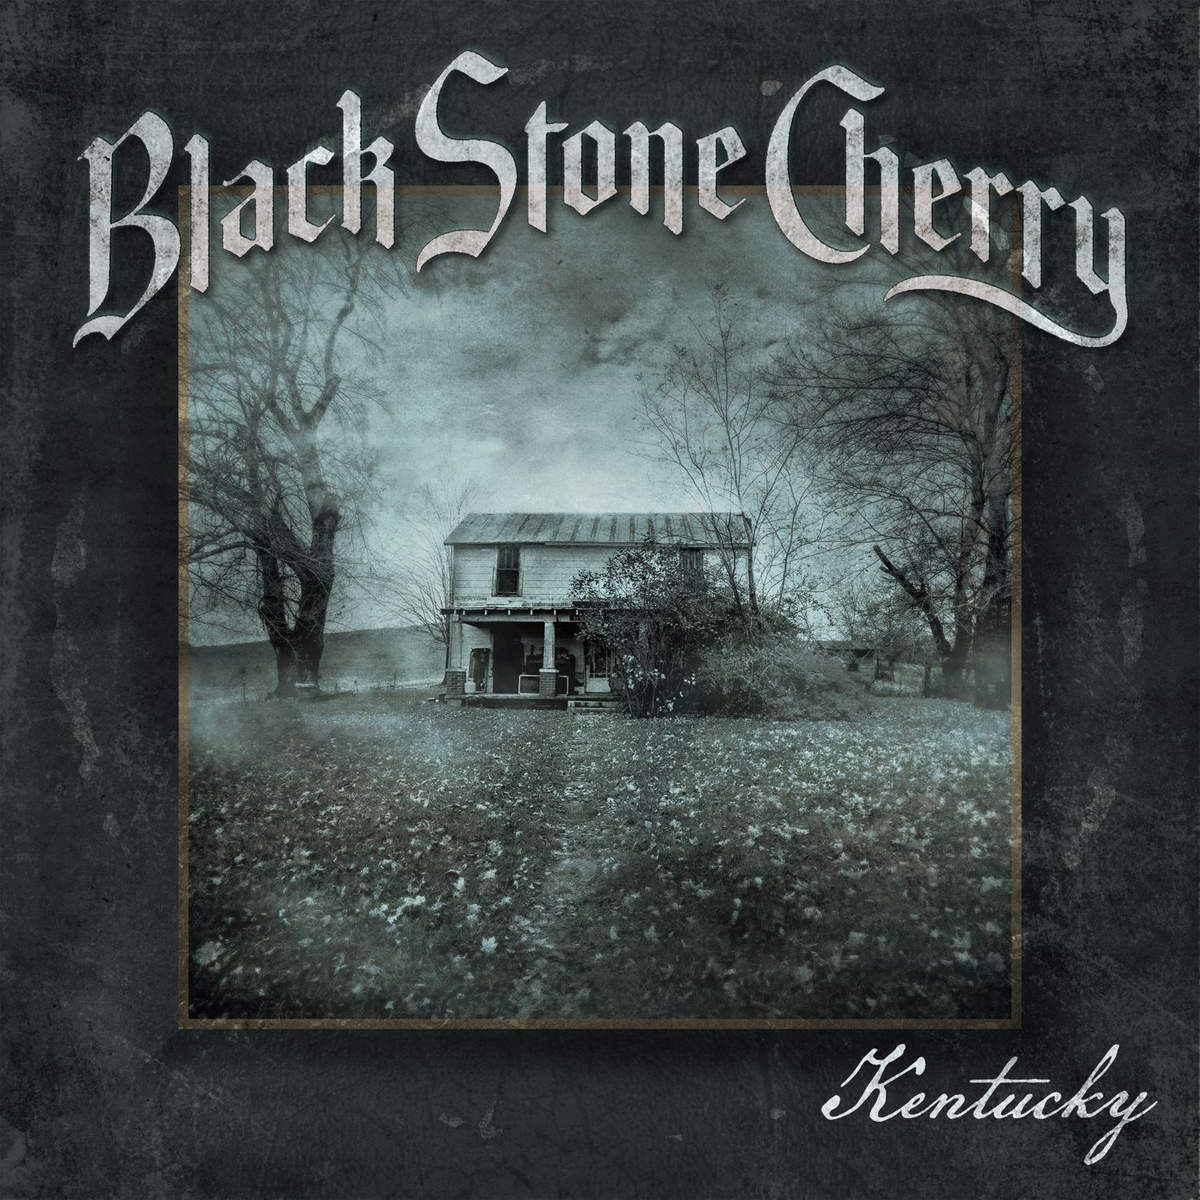 Black Stone Cherry - Kentucky album cover